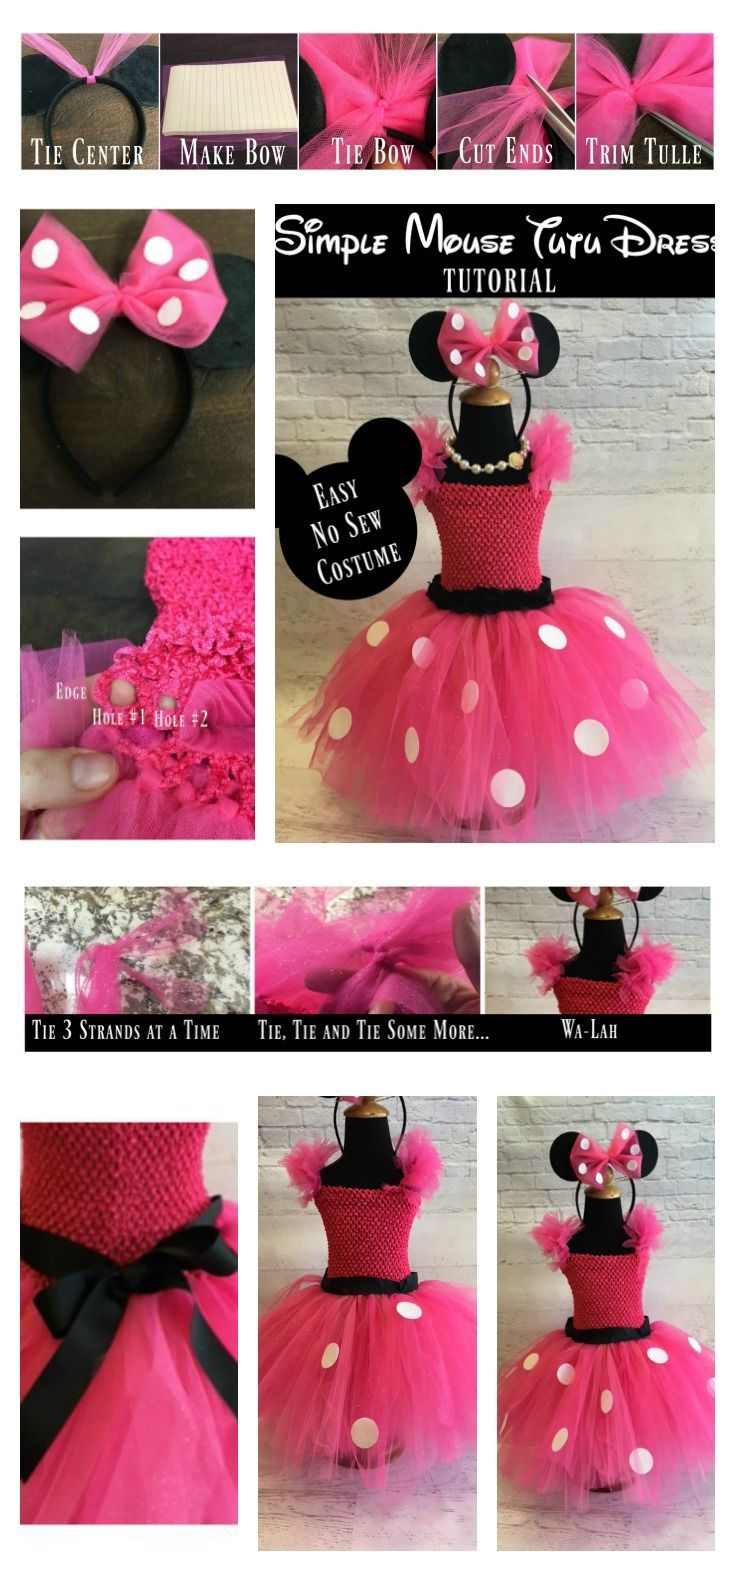 Mouse Tutu Dress Tutorial | Ideas para disfraces, Ropa niña y Ideas para